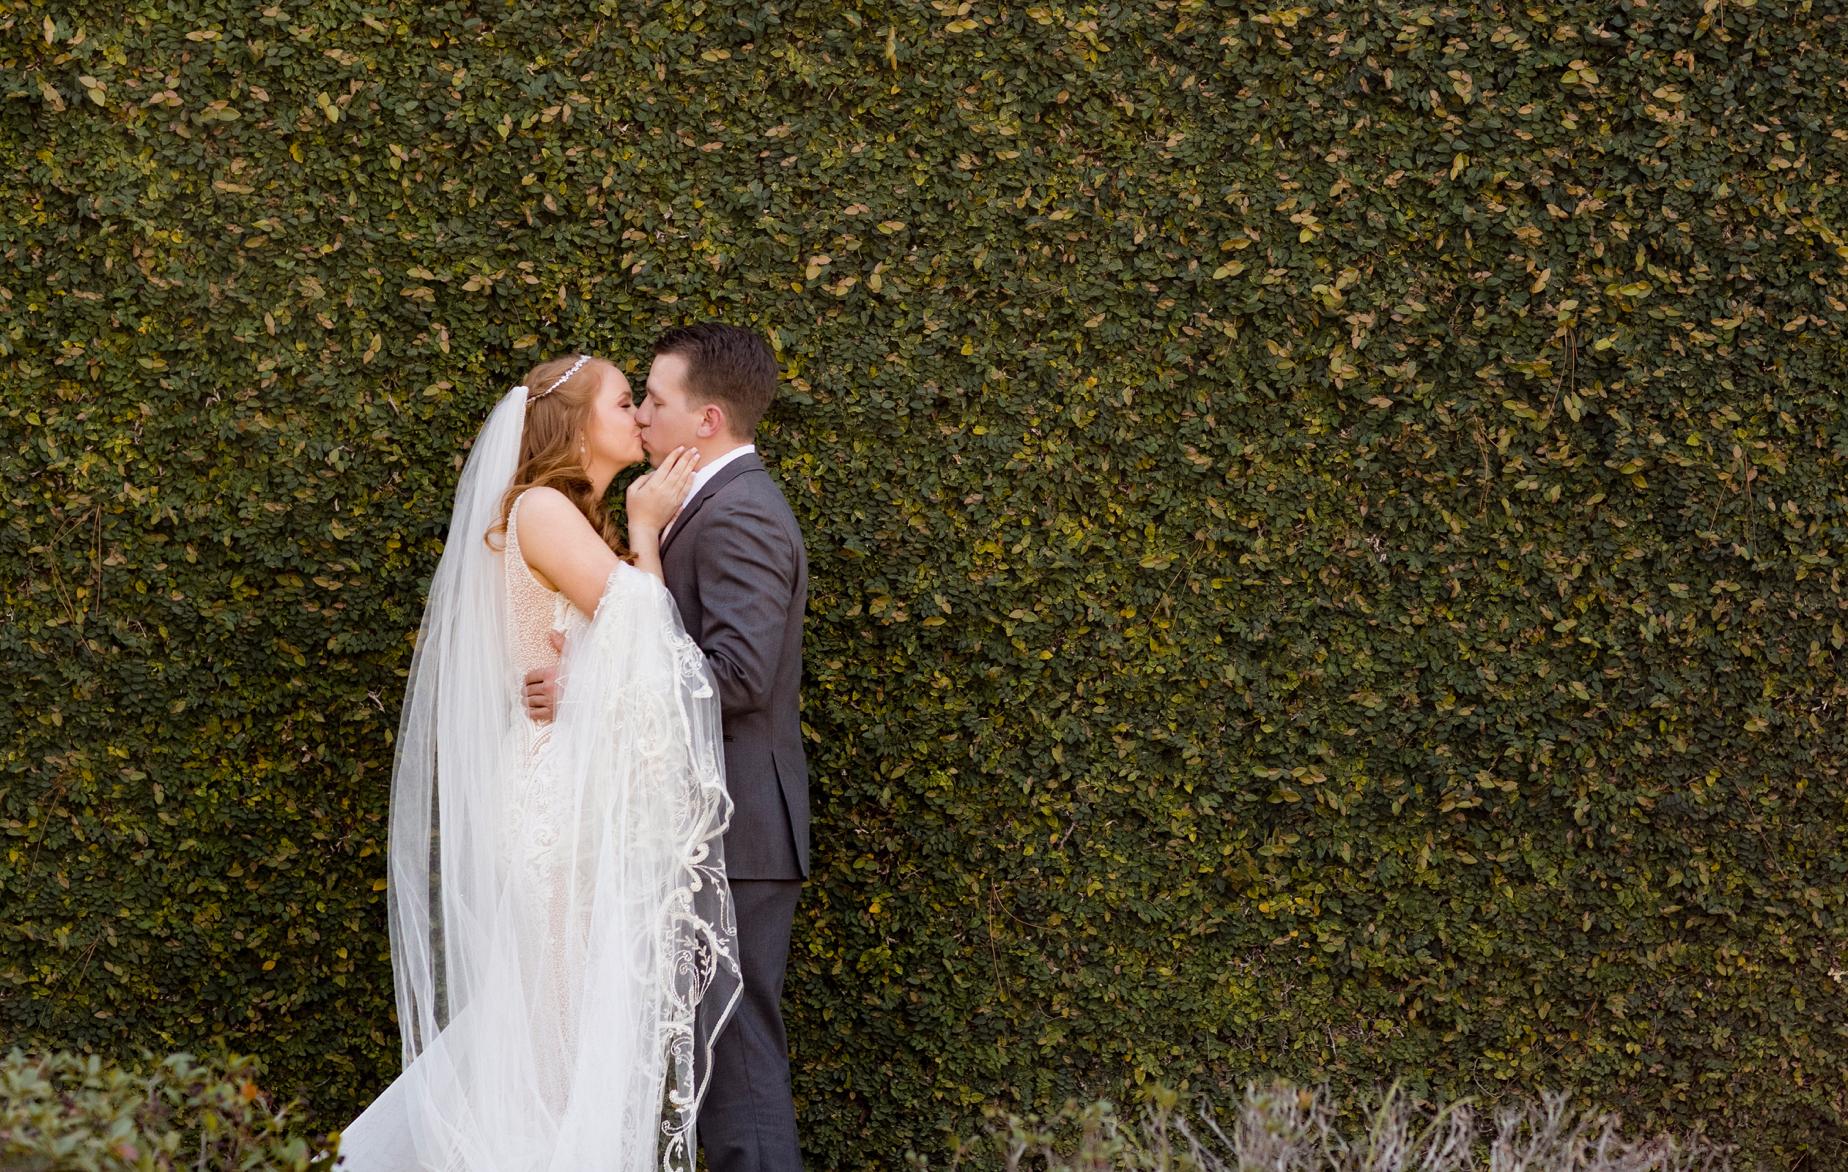 Wedding kiss - Aislinn Kate Wedding Photography - Pensacola, Florida